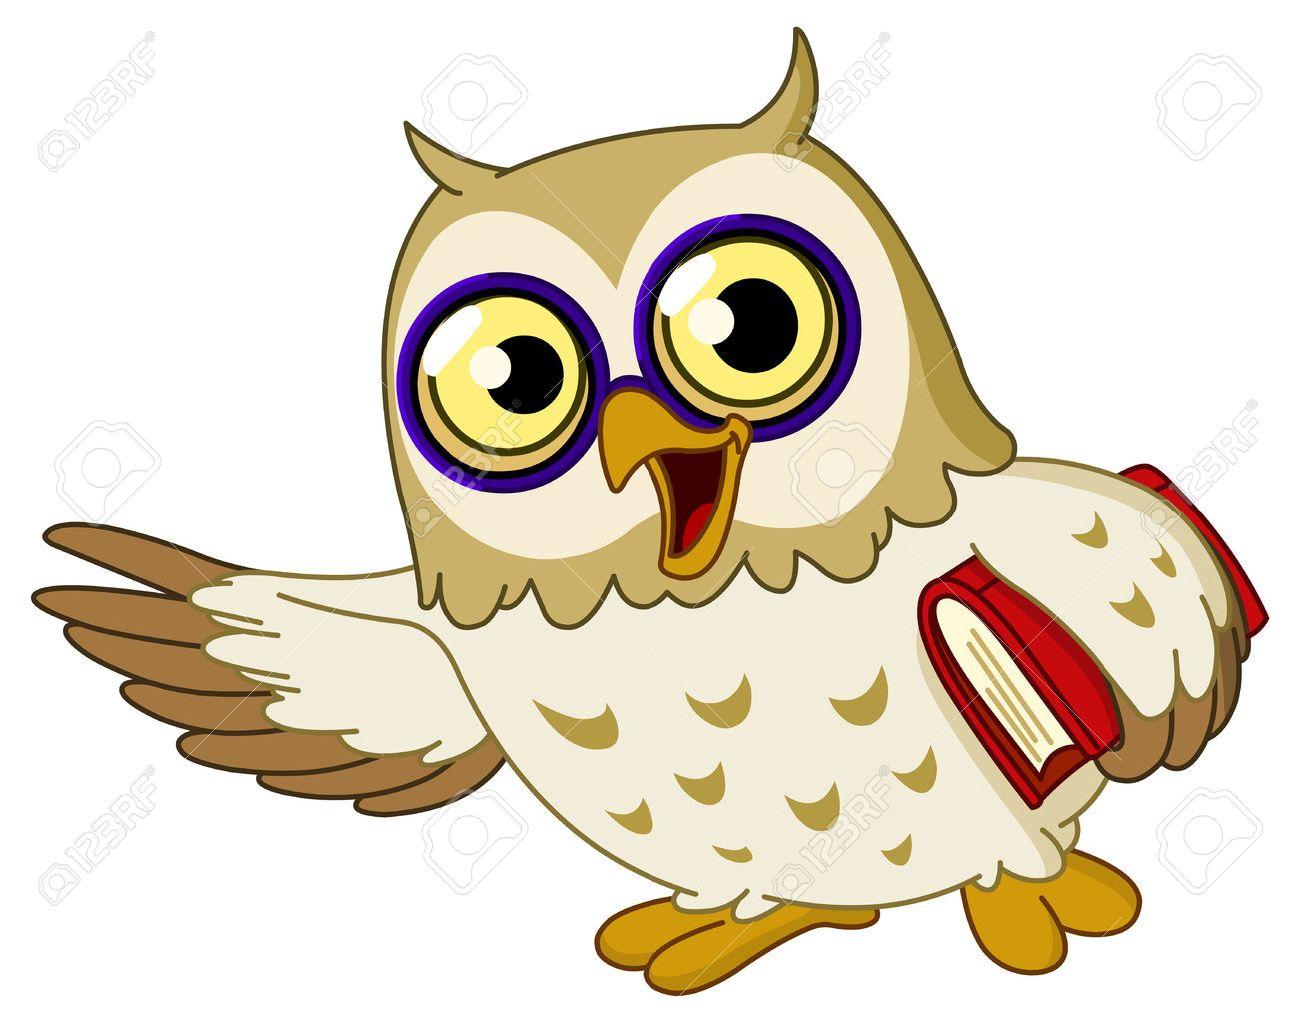 cartoon wise owl teaching royalty free cliparts vectors and stock rh 123rf com Owl Sayings for Teachers Owl School Clip Art